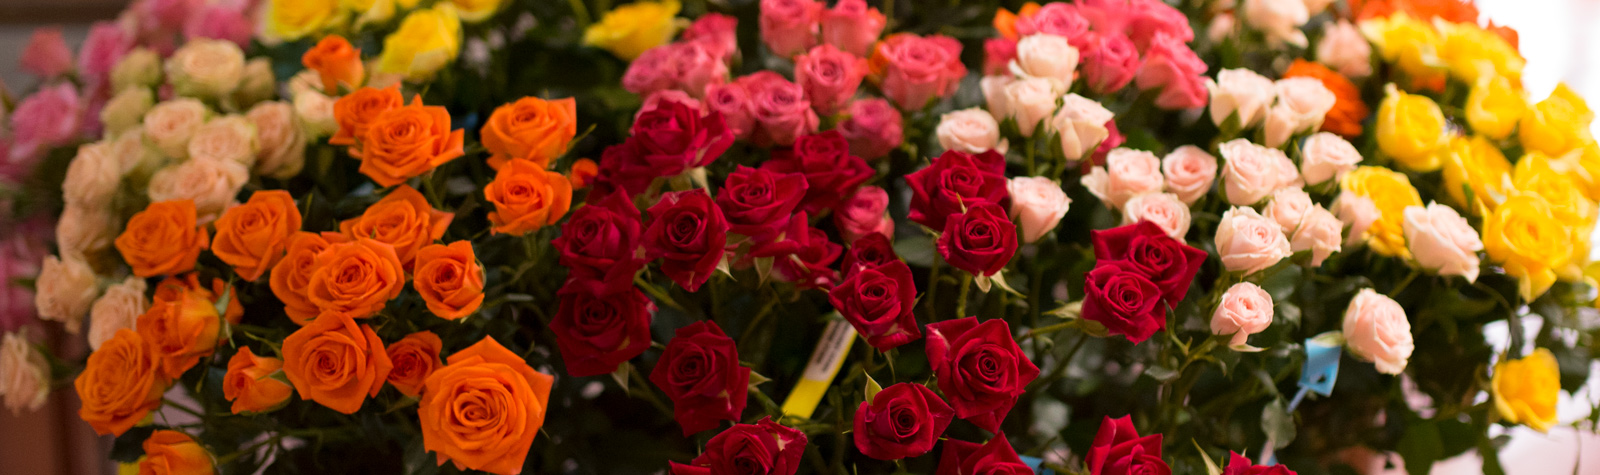 Celebra San Valentín con Interflora